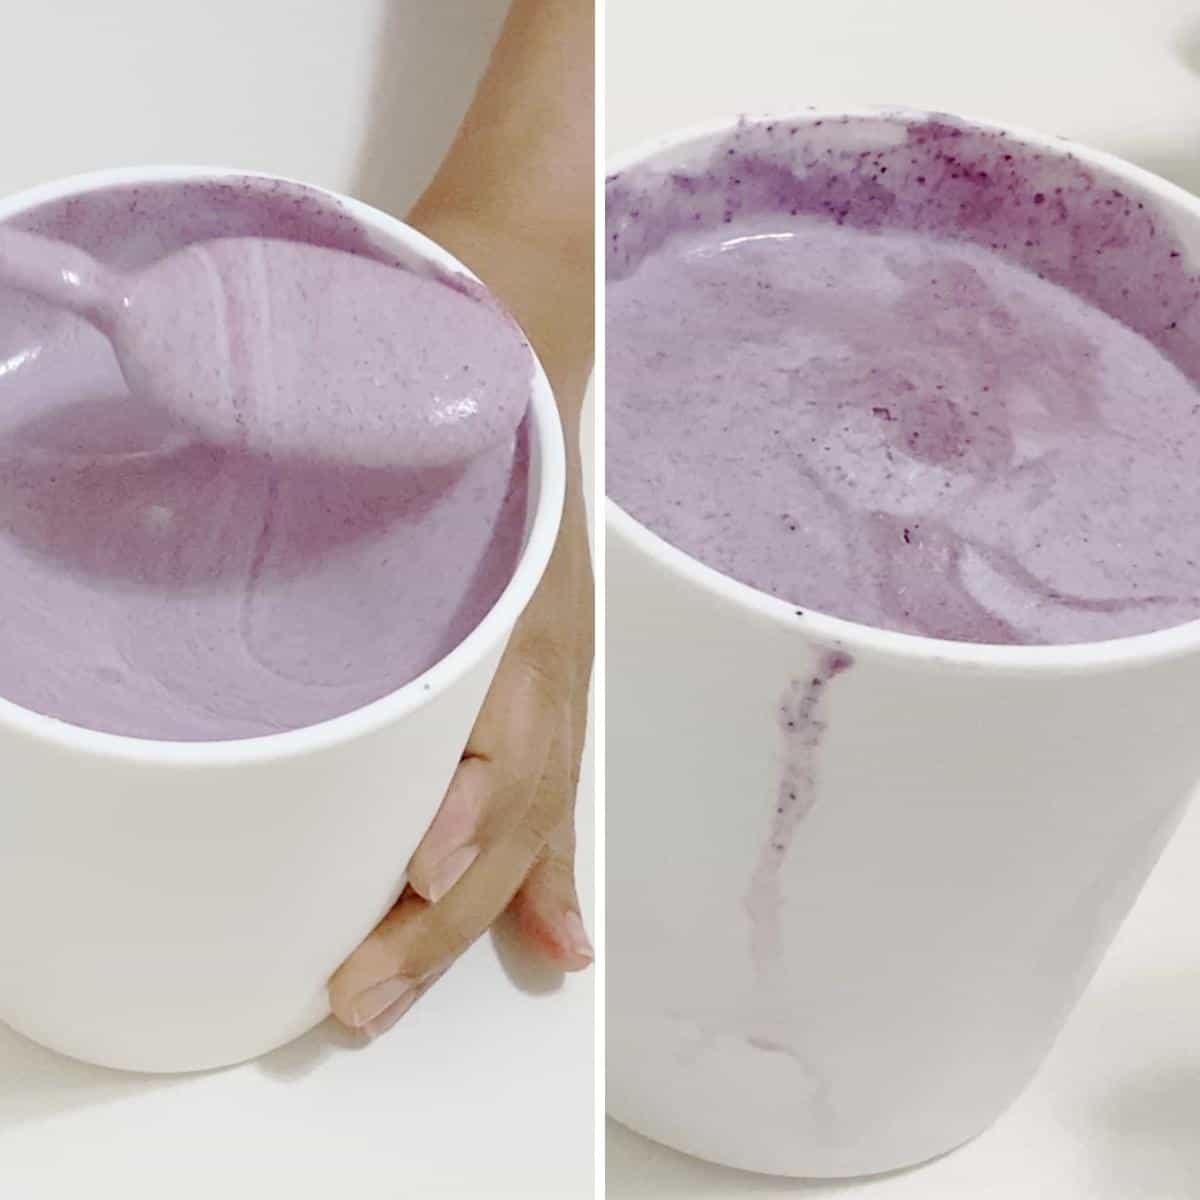 Tubs of blueberry ice cream.